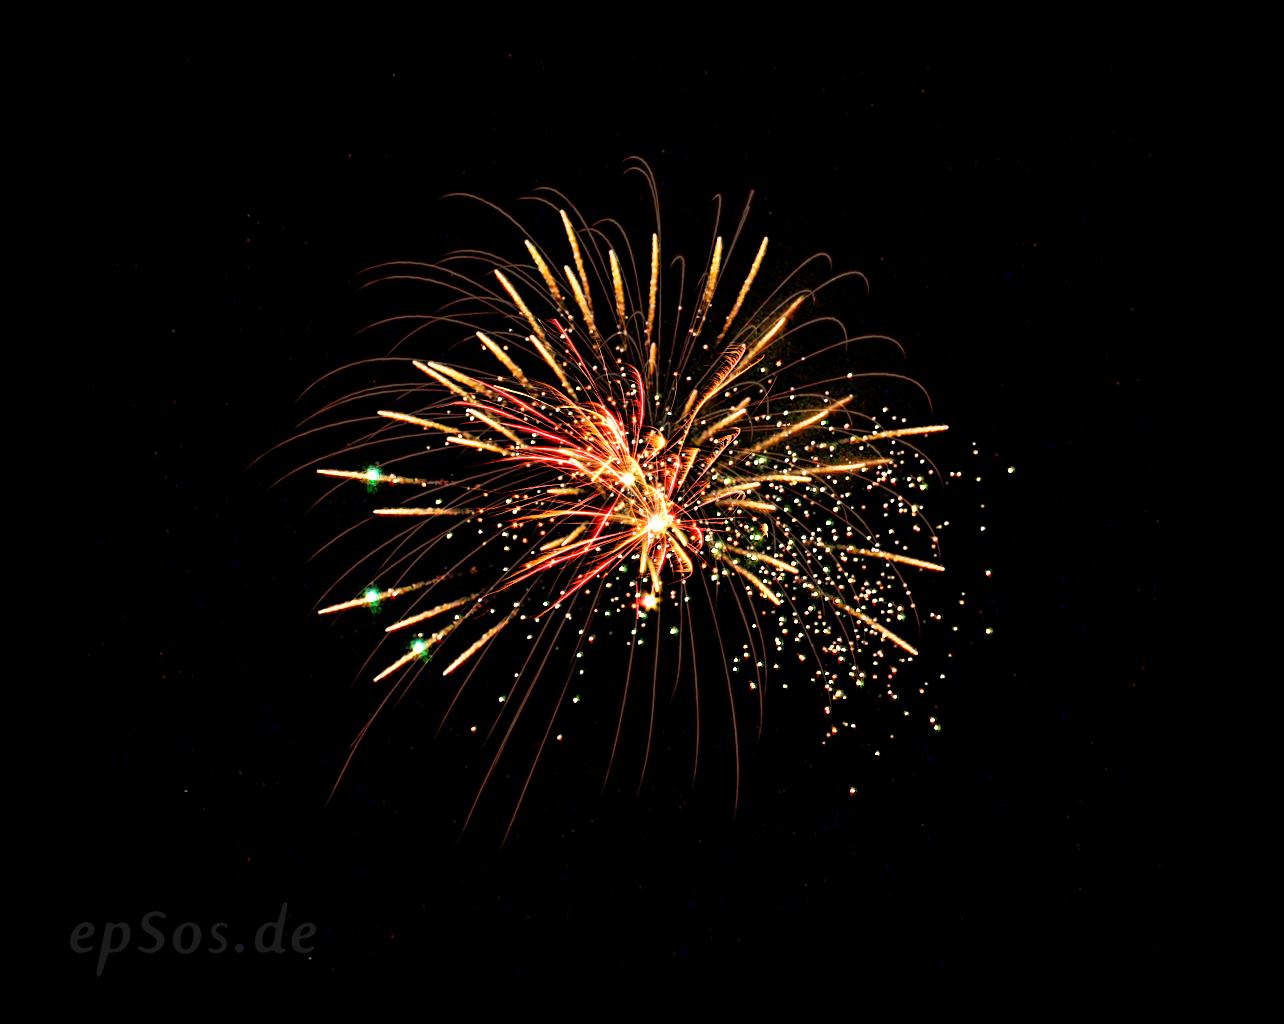 Best Free Fireworks Png Image #30604.